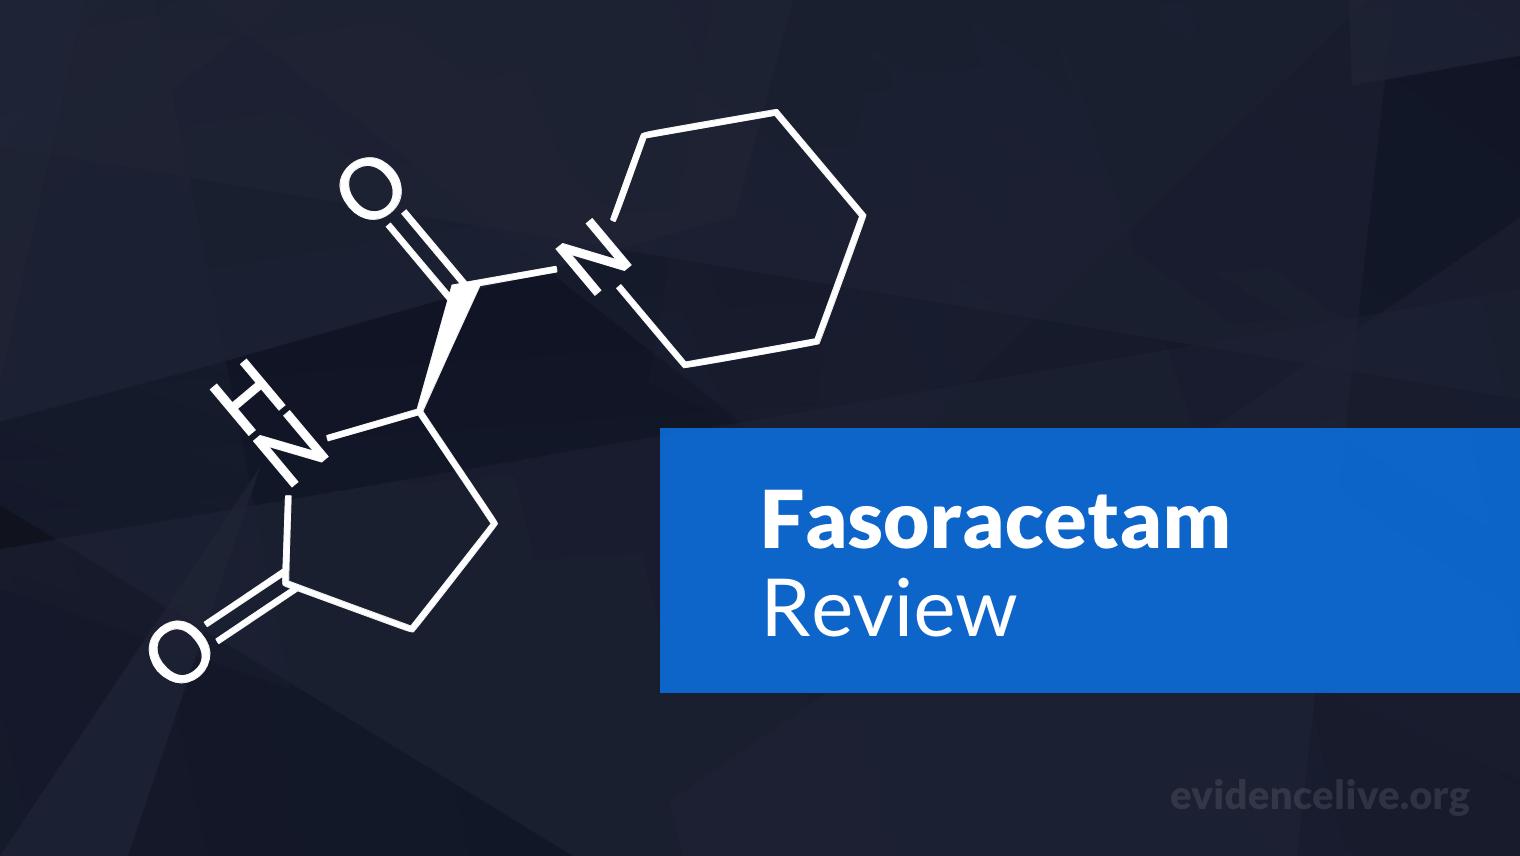 Fasoracetam: Benefits, Uses, Dosage, and Side Effects